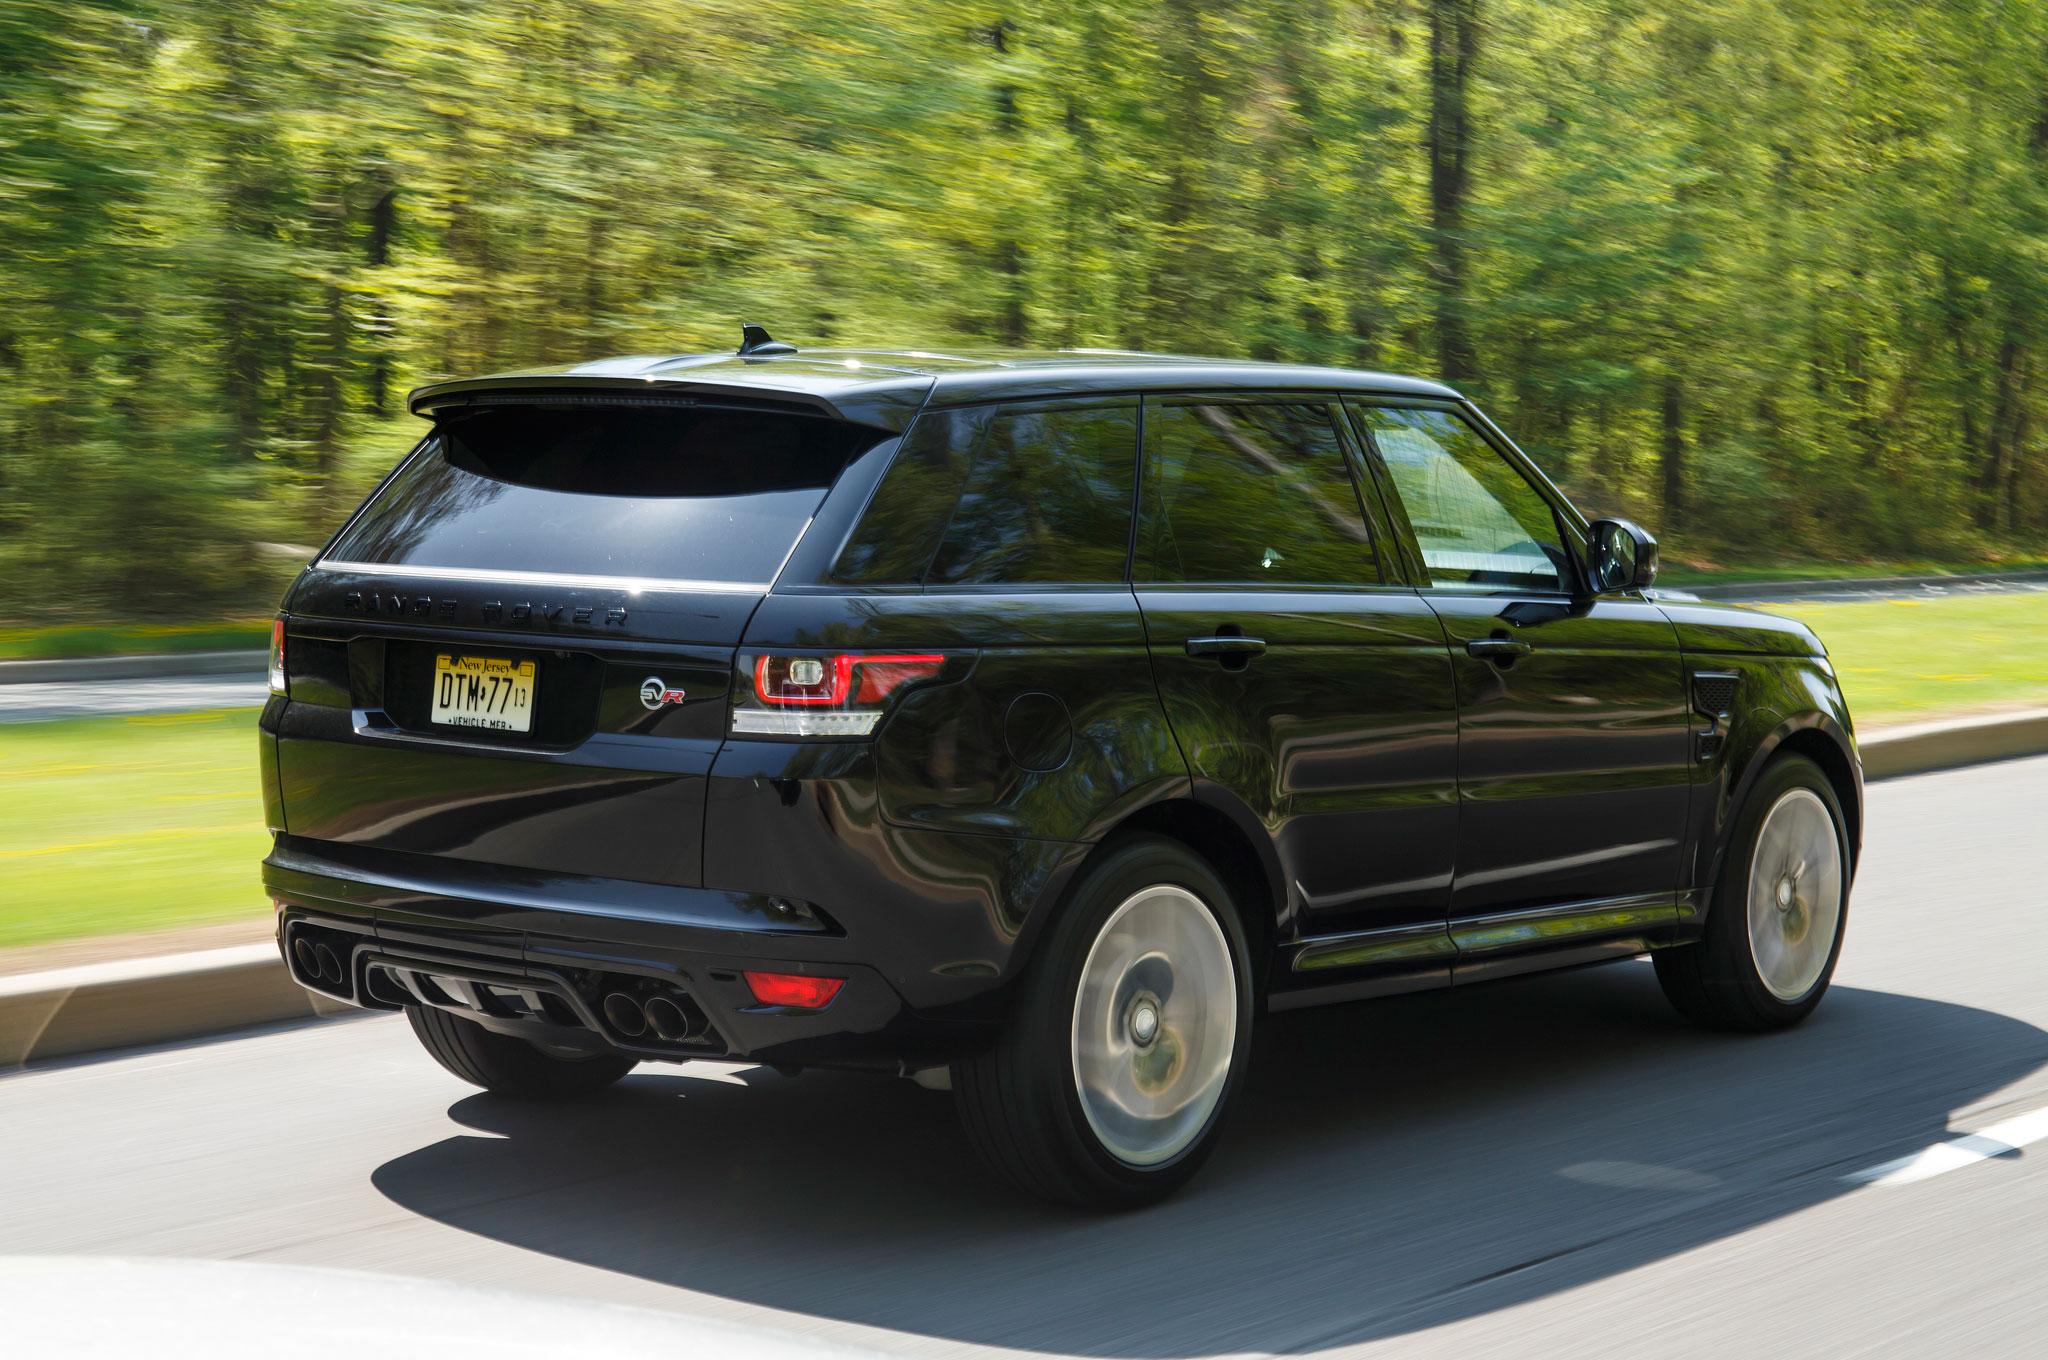 2015 Land Rover Range Rover Sport SVR Review | Automobile Magazine